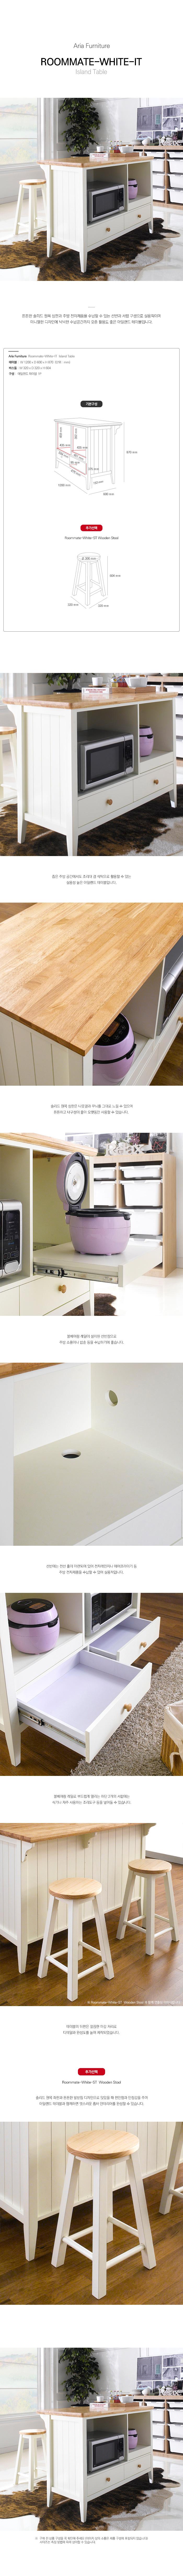 6_15_Room_mate-White_Kitchen_Table.jpg